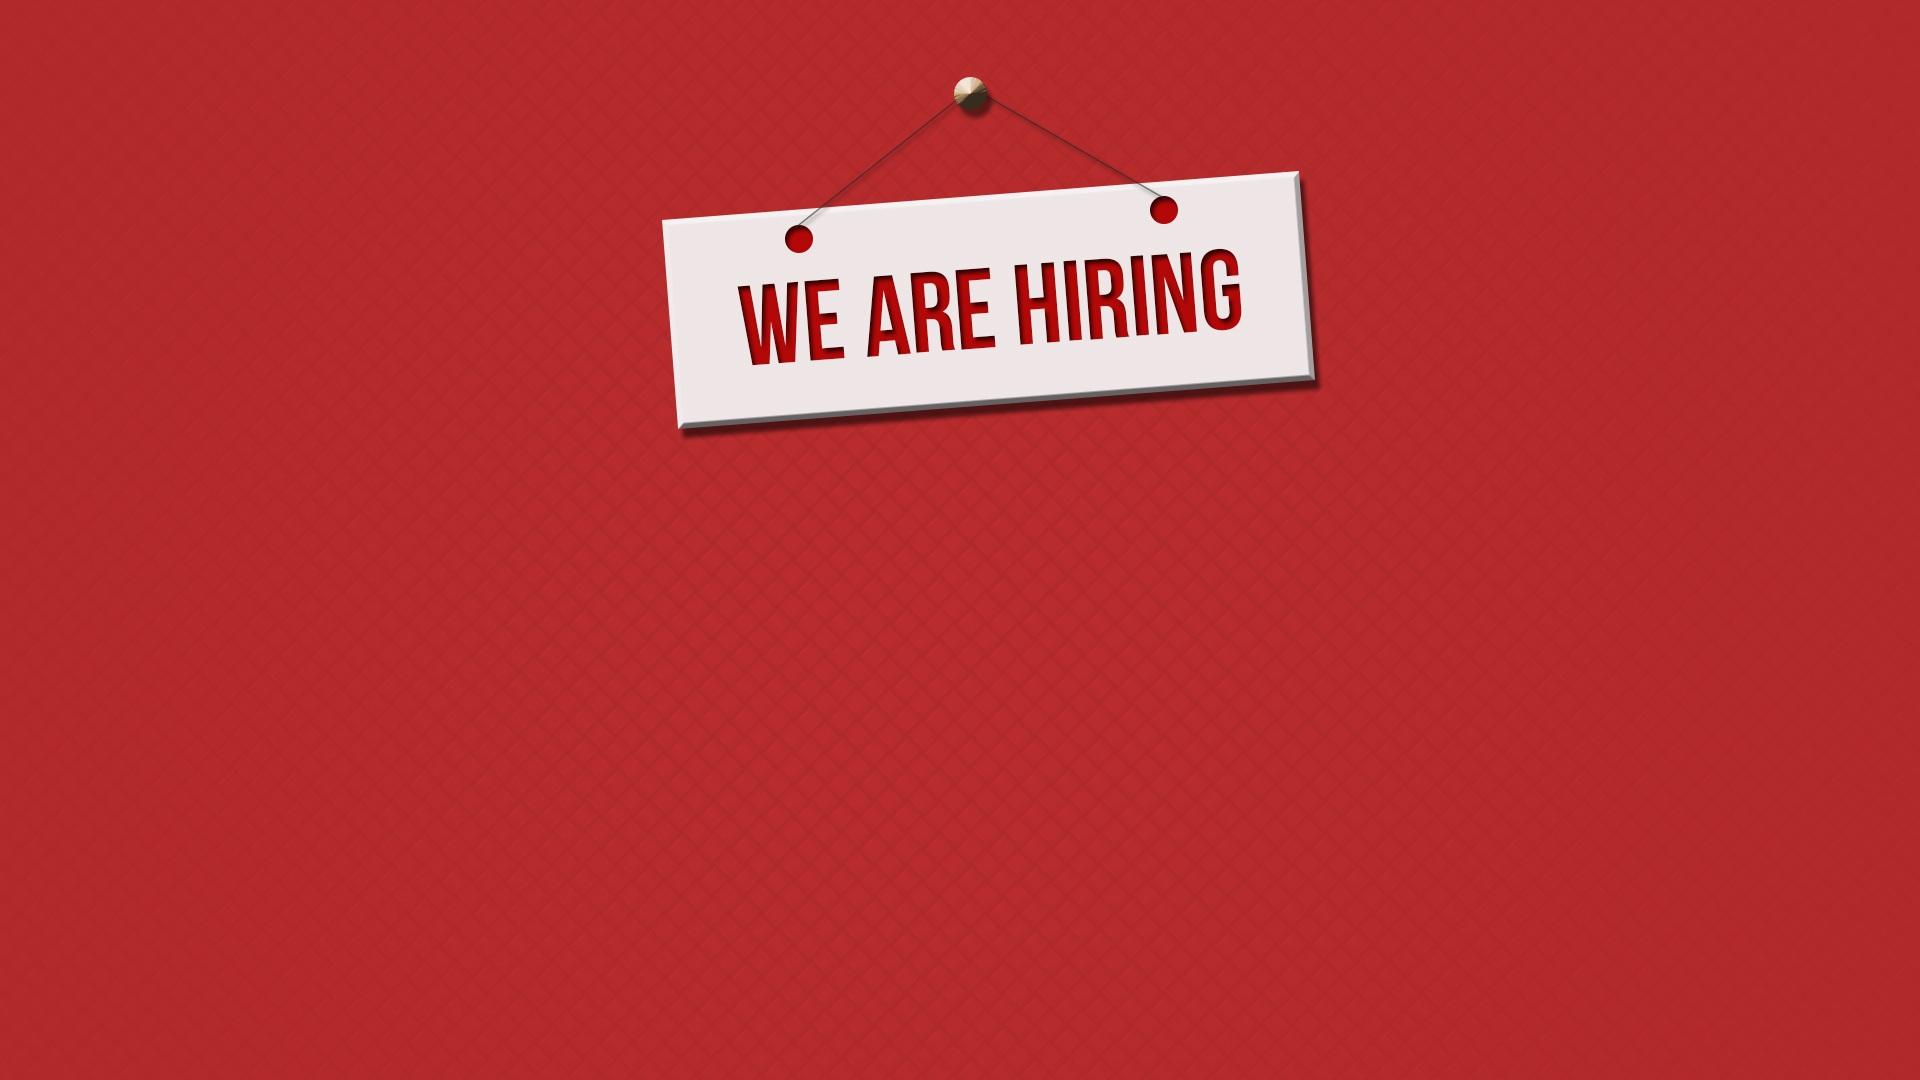 hiring-2575036.jpg